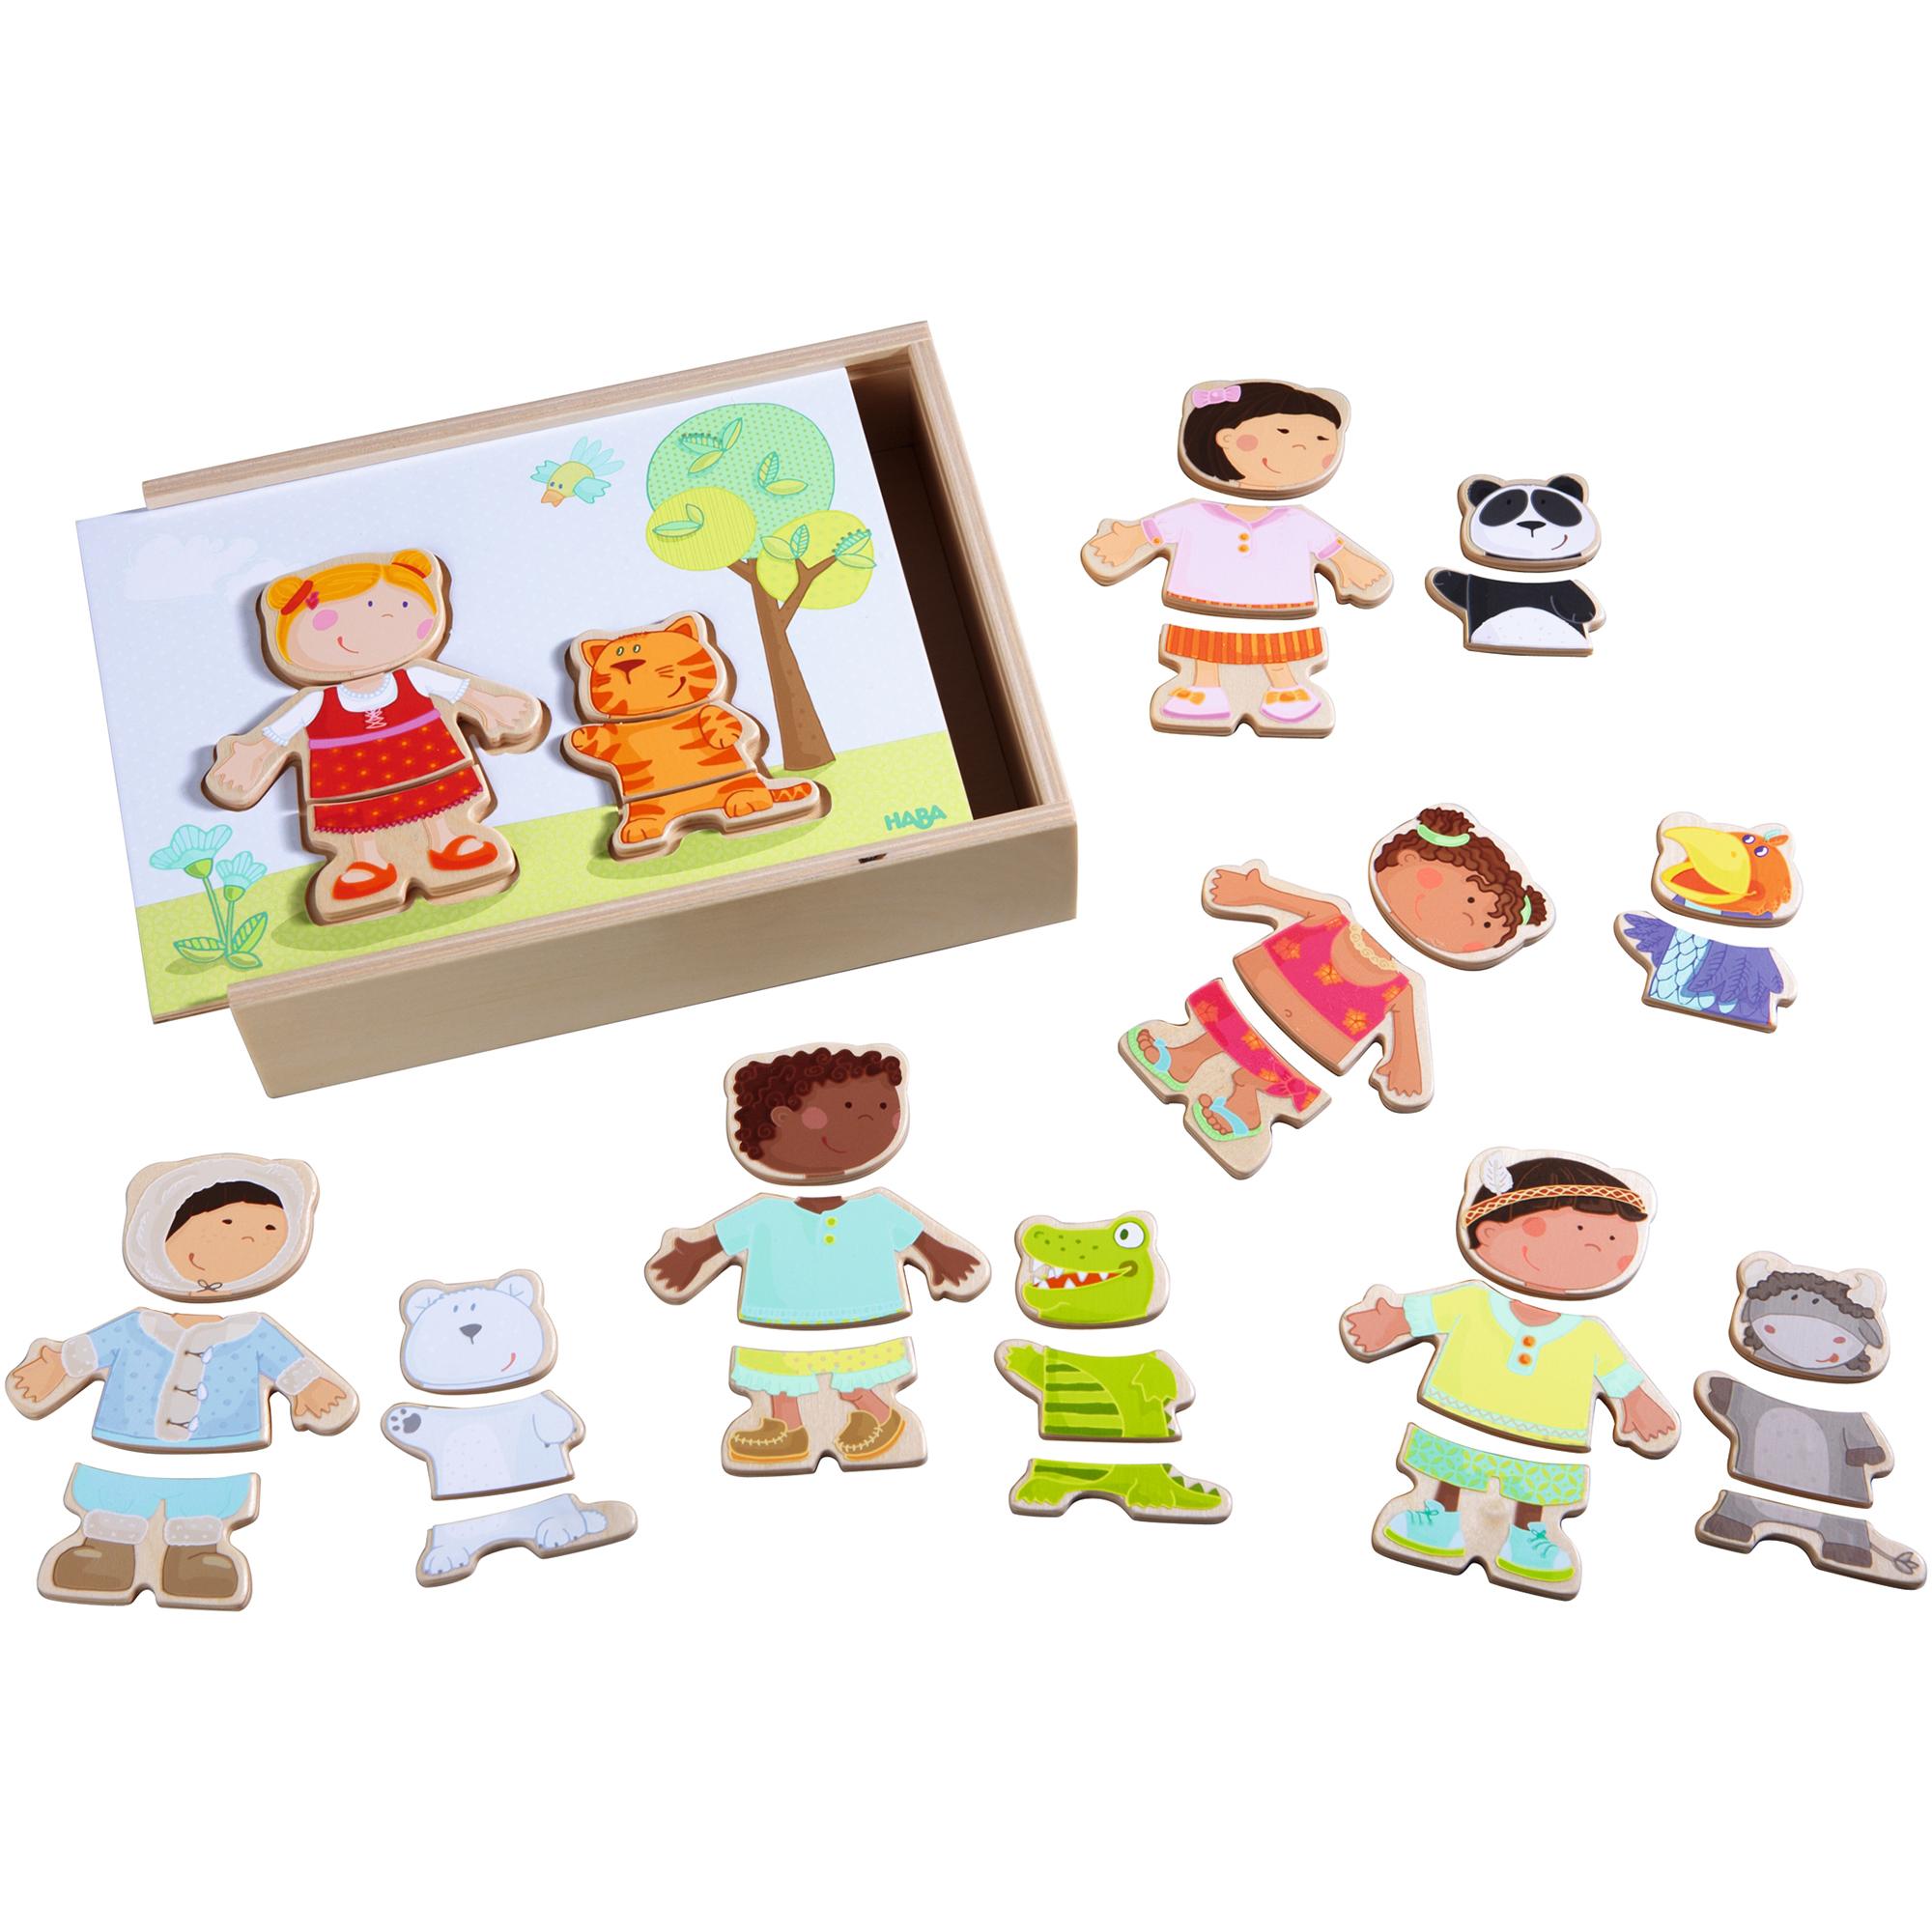 Puzzle din lemn, Haba, Copiii lumii, 36 piese, 18luni+